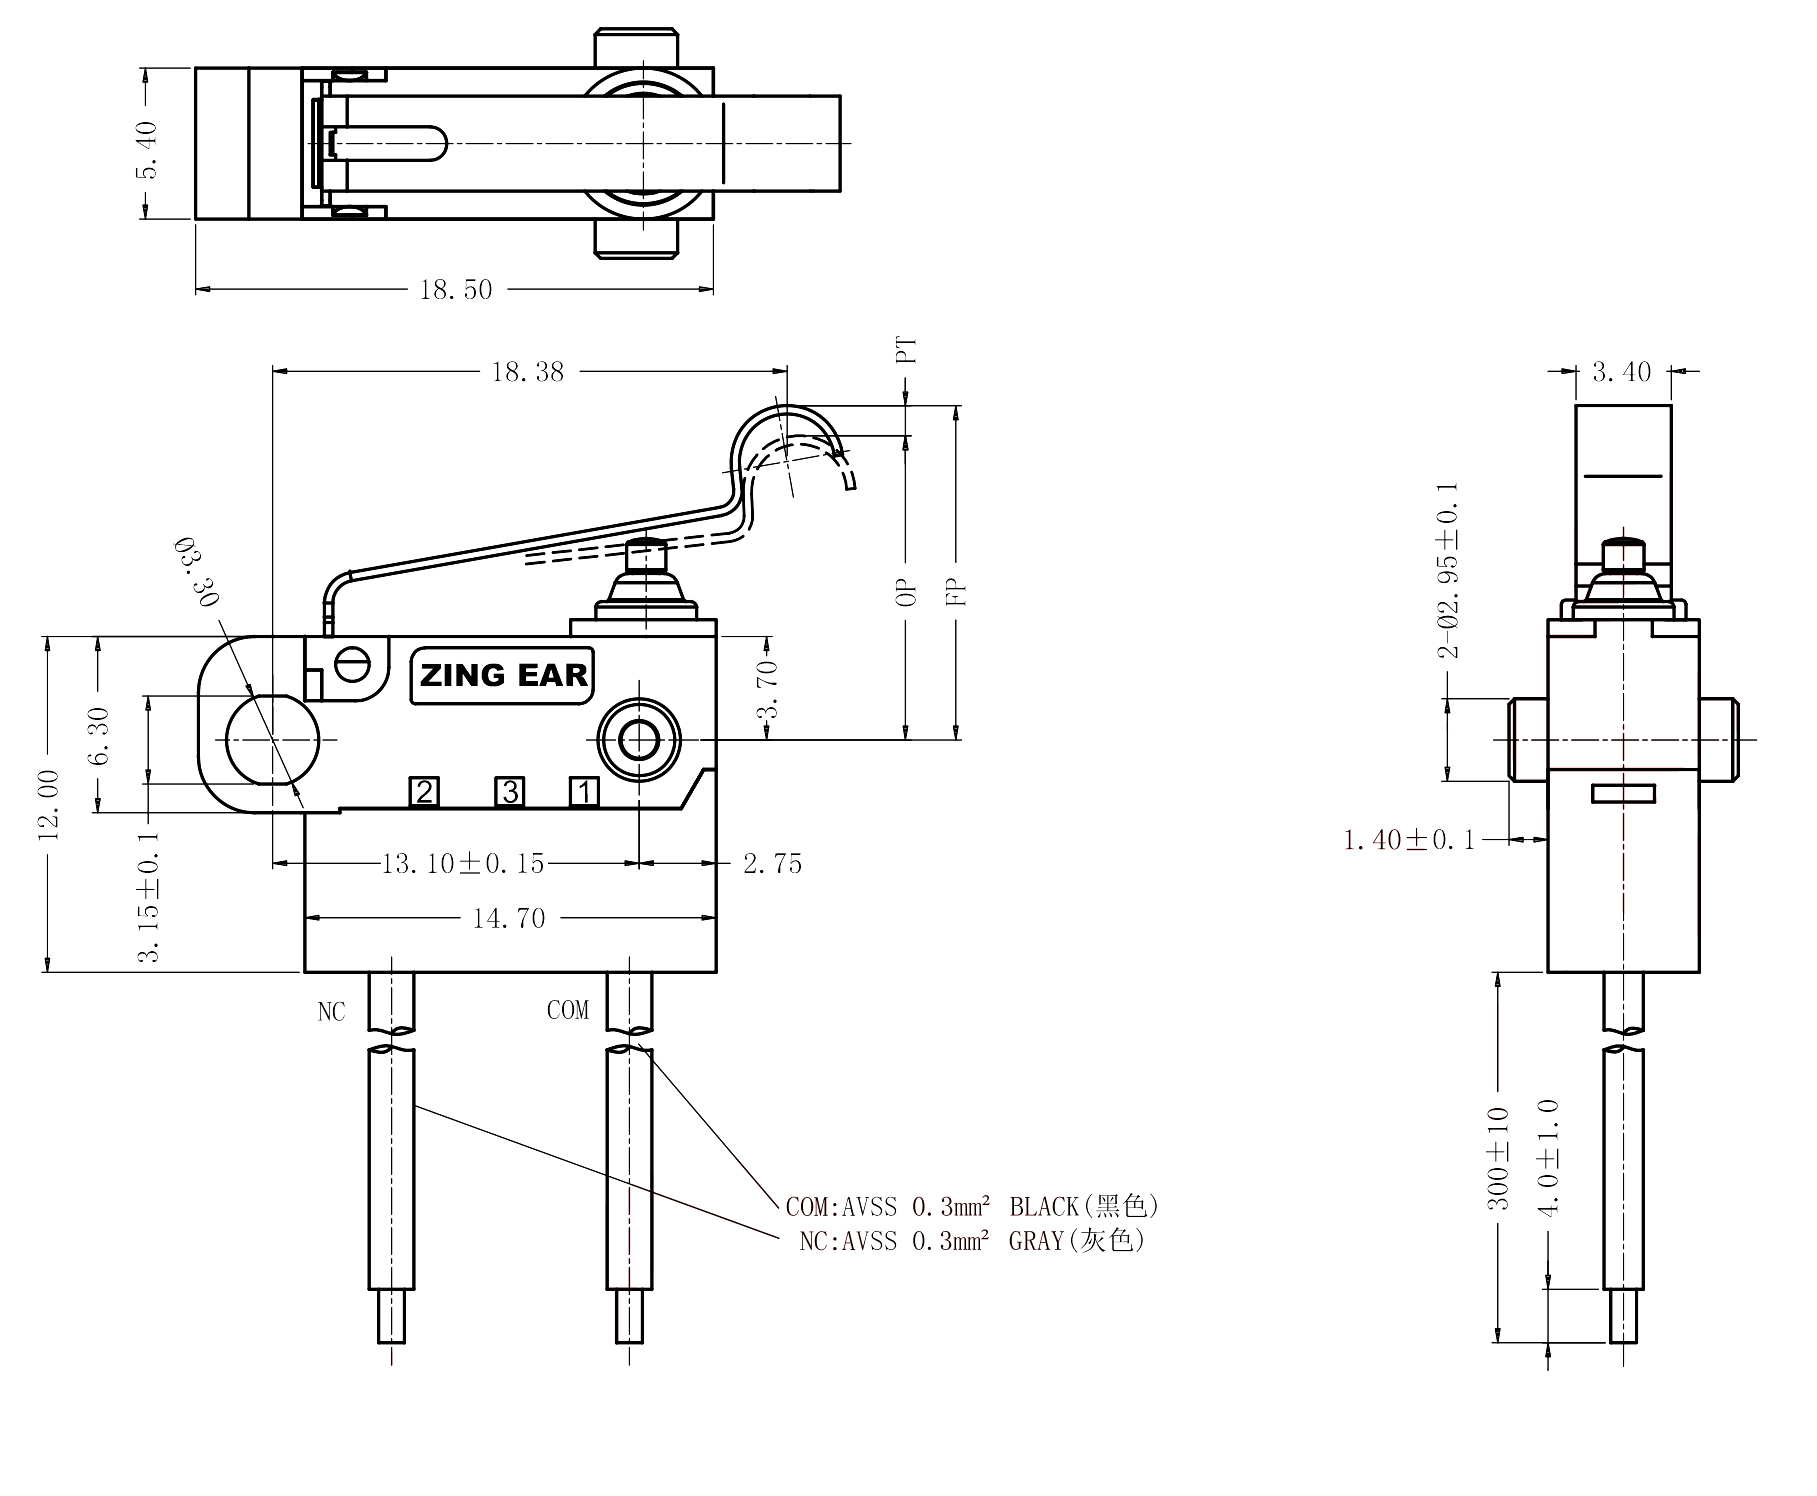 Drawing_G303-130E05B7-GF_Rev_A0